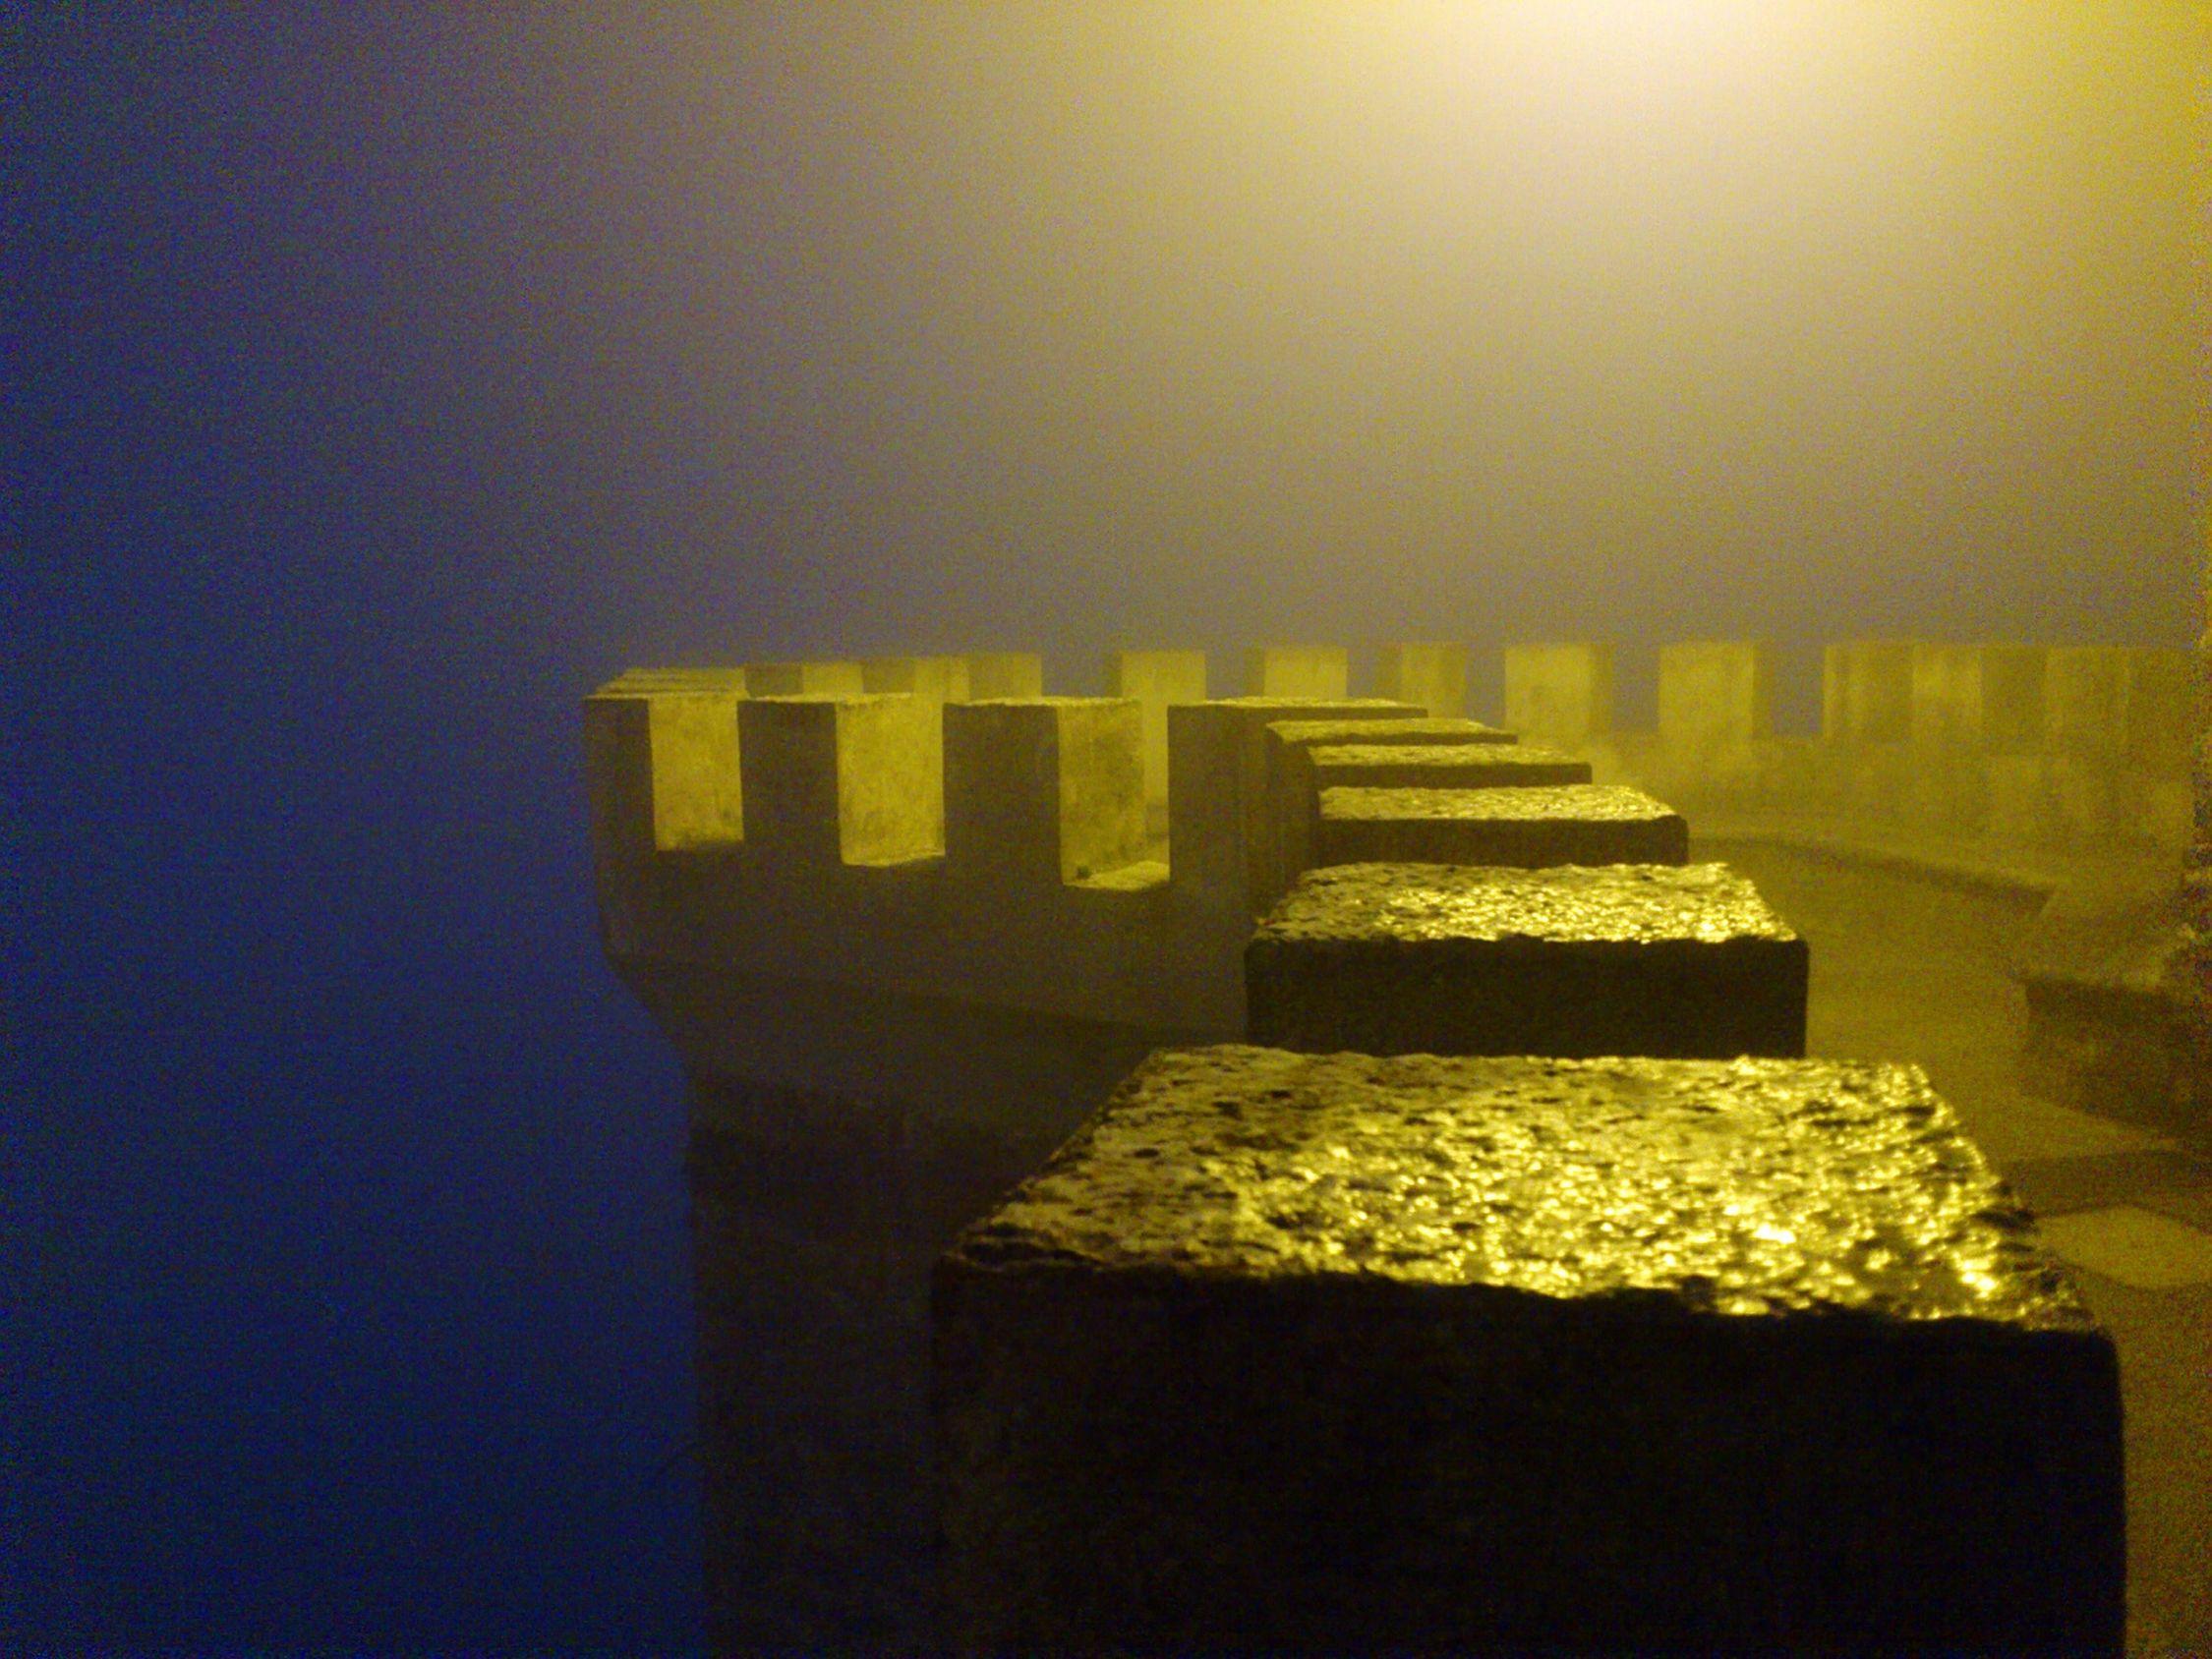 Venere's Castle Merrychristmas❄️ Erice Italia Nightphotography Night Lights EyeEm Gallery Shadows & Lights Aroundtheworld Around Town